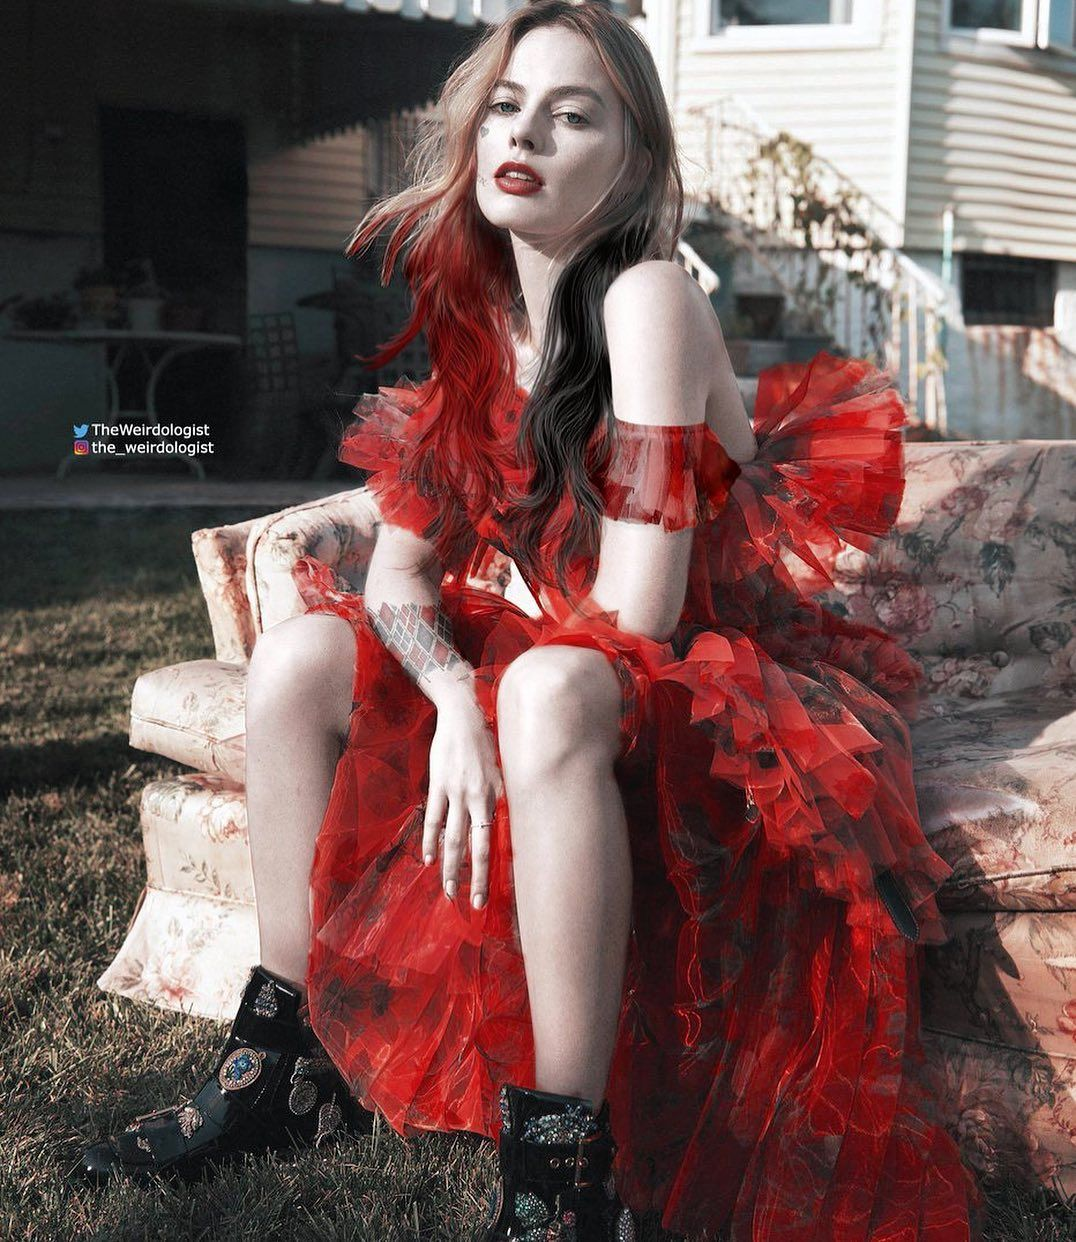 819 Otmetok Nravitsya 2 Kommentariev Dc Marvel Random Dcmarvel Rdm V Instagram Harley Freakin Quinn Cosplay Feminino Arlequina Margot Robbie